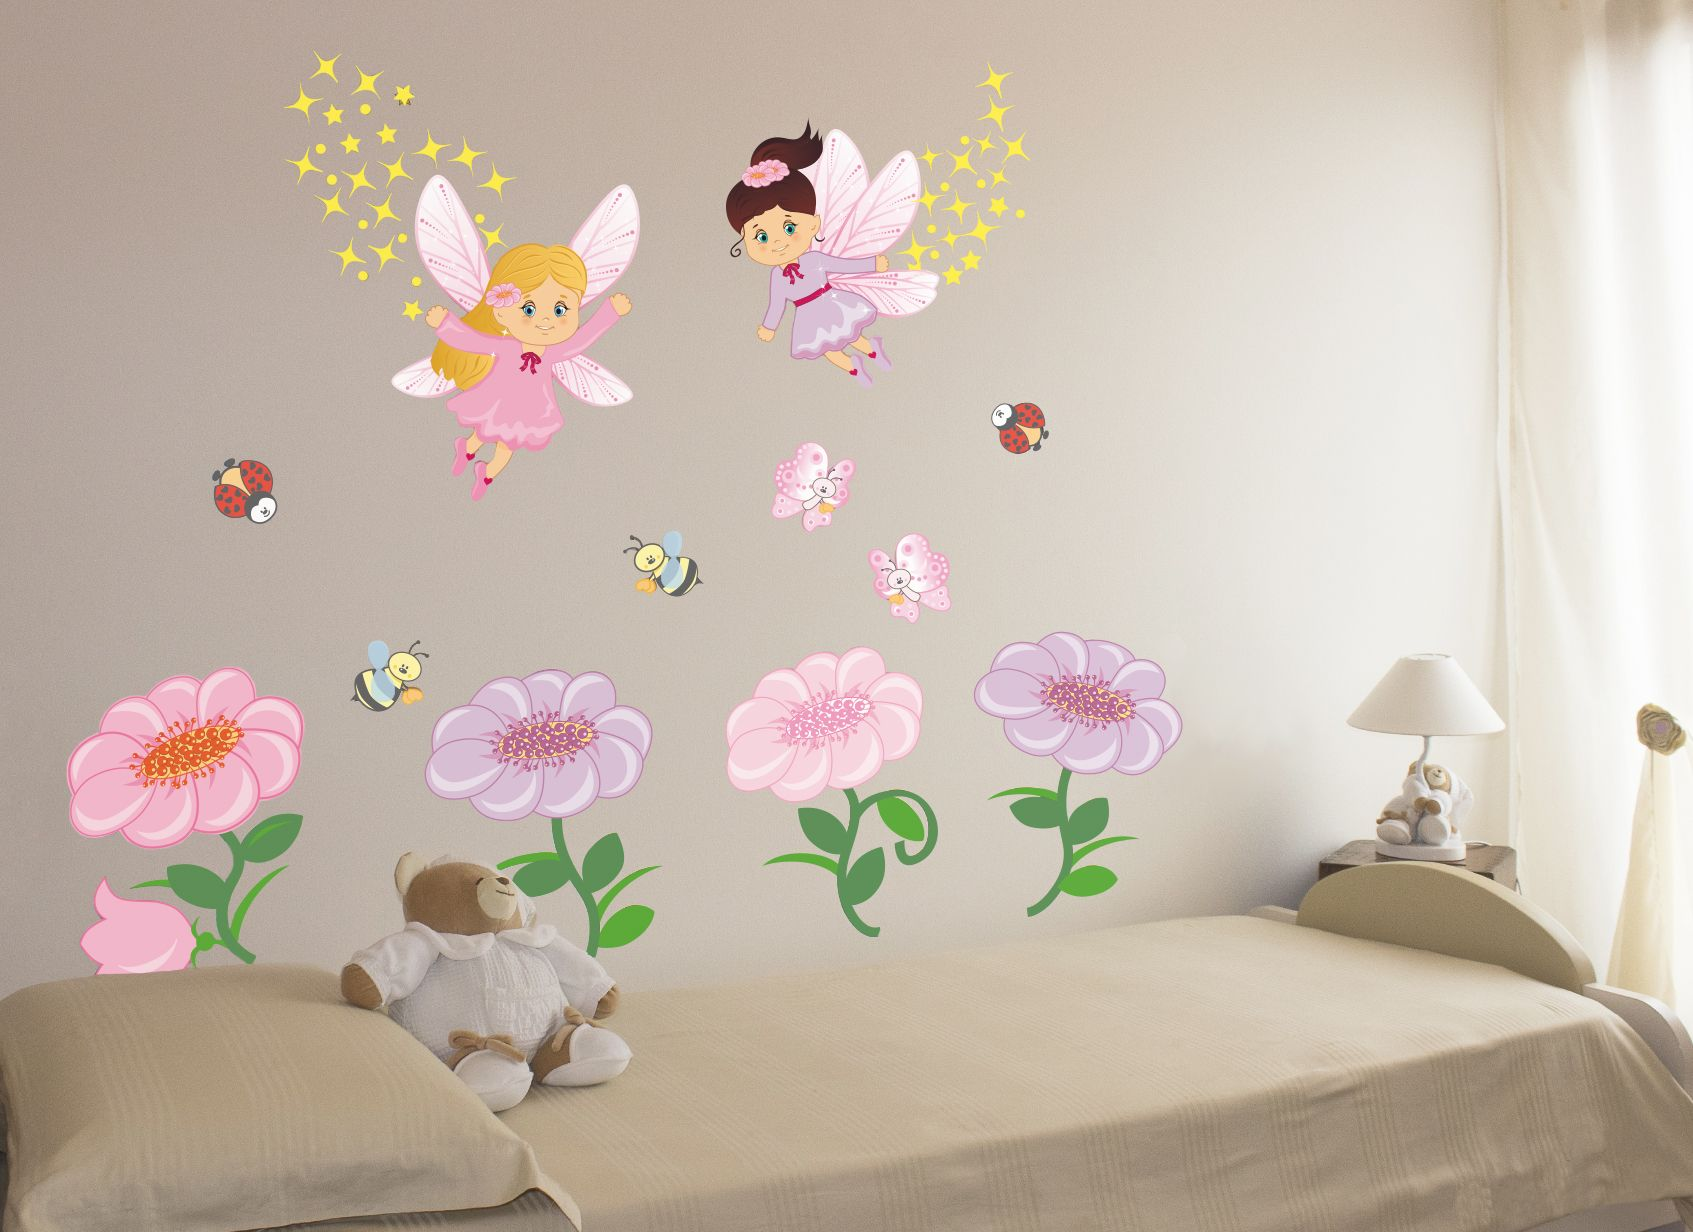 Sfondi Bambini ~ Wall stickers bambini adesivi murali. kit le fate dei fiori